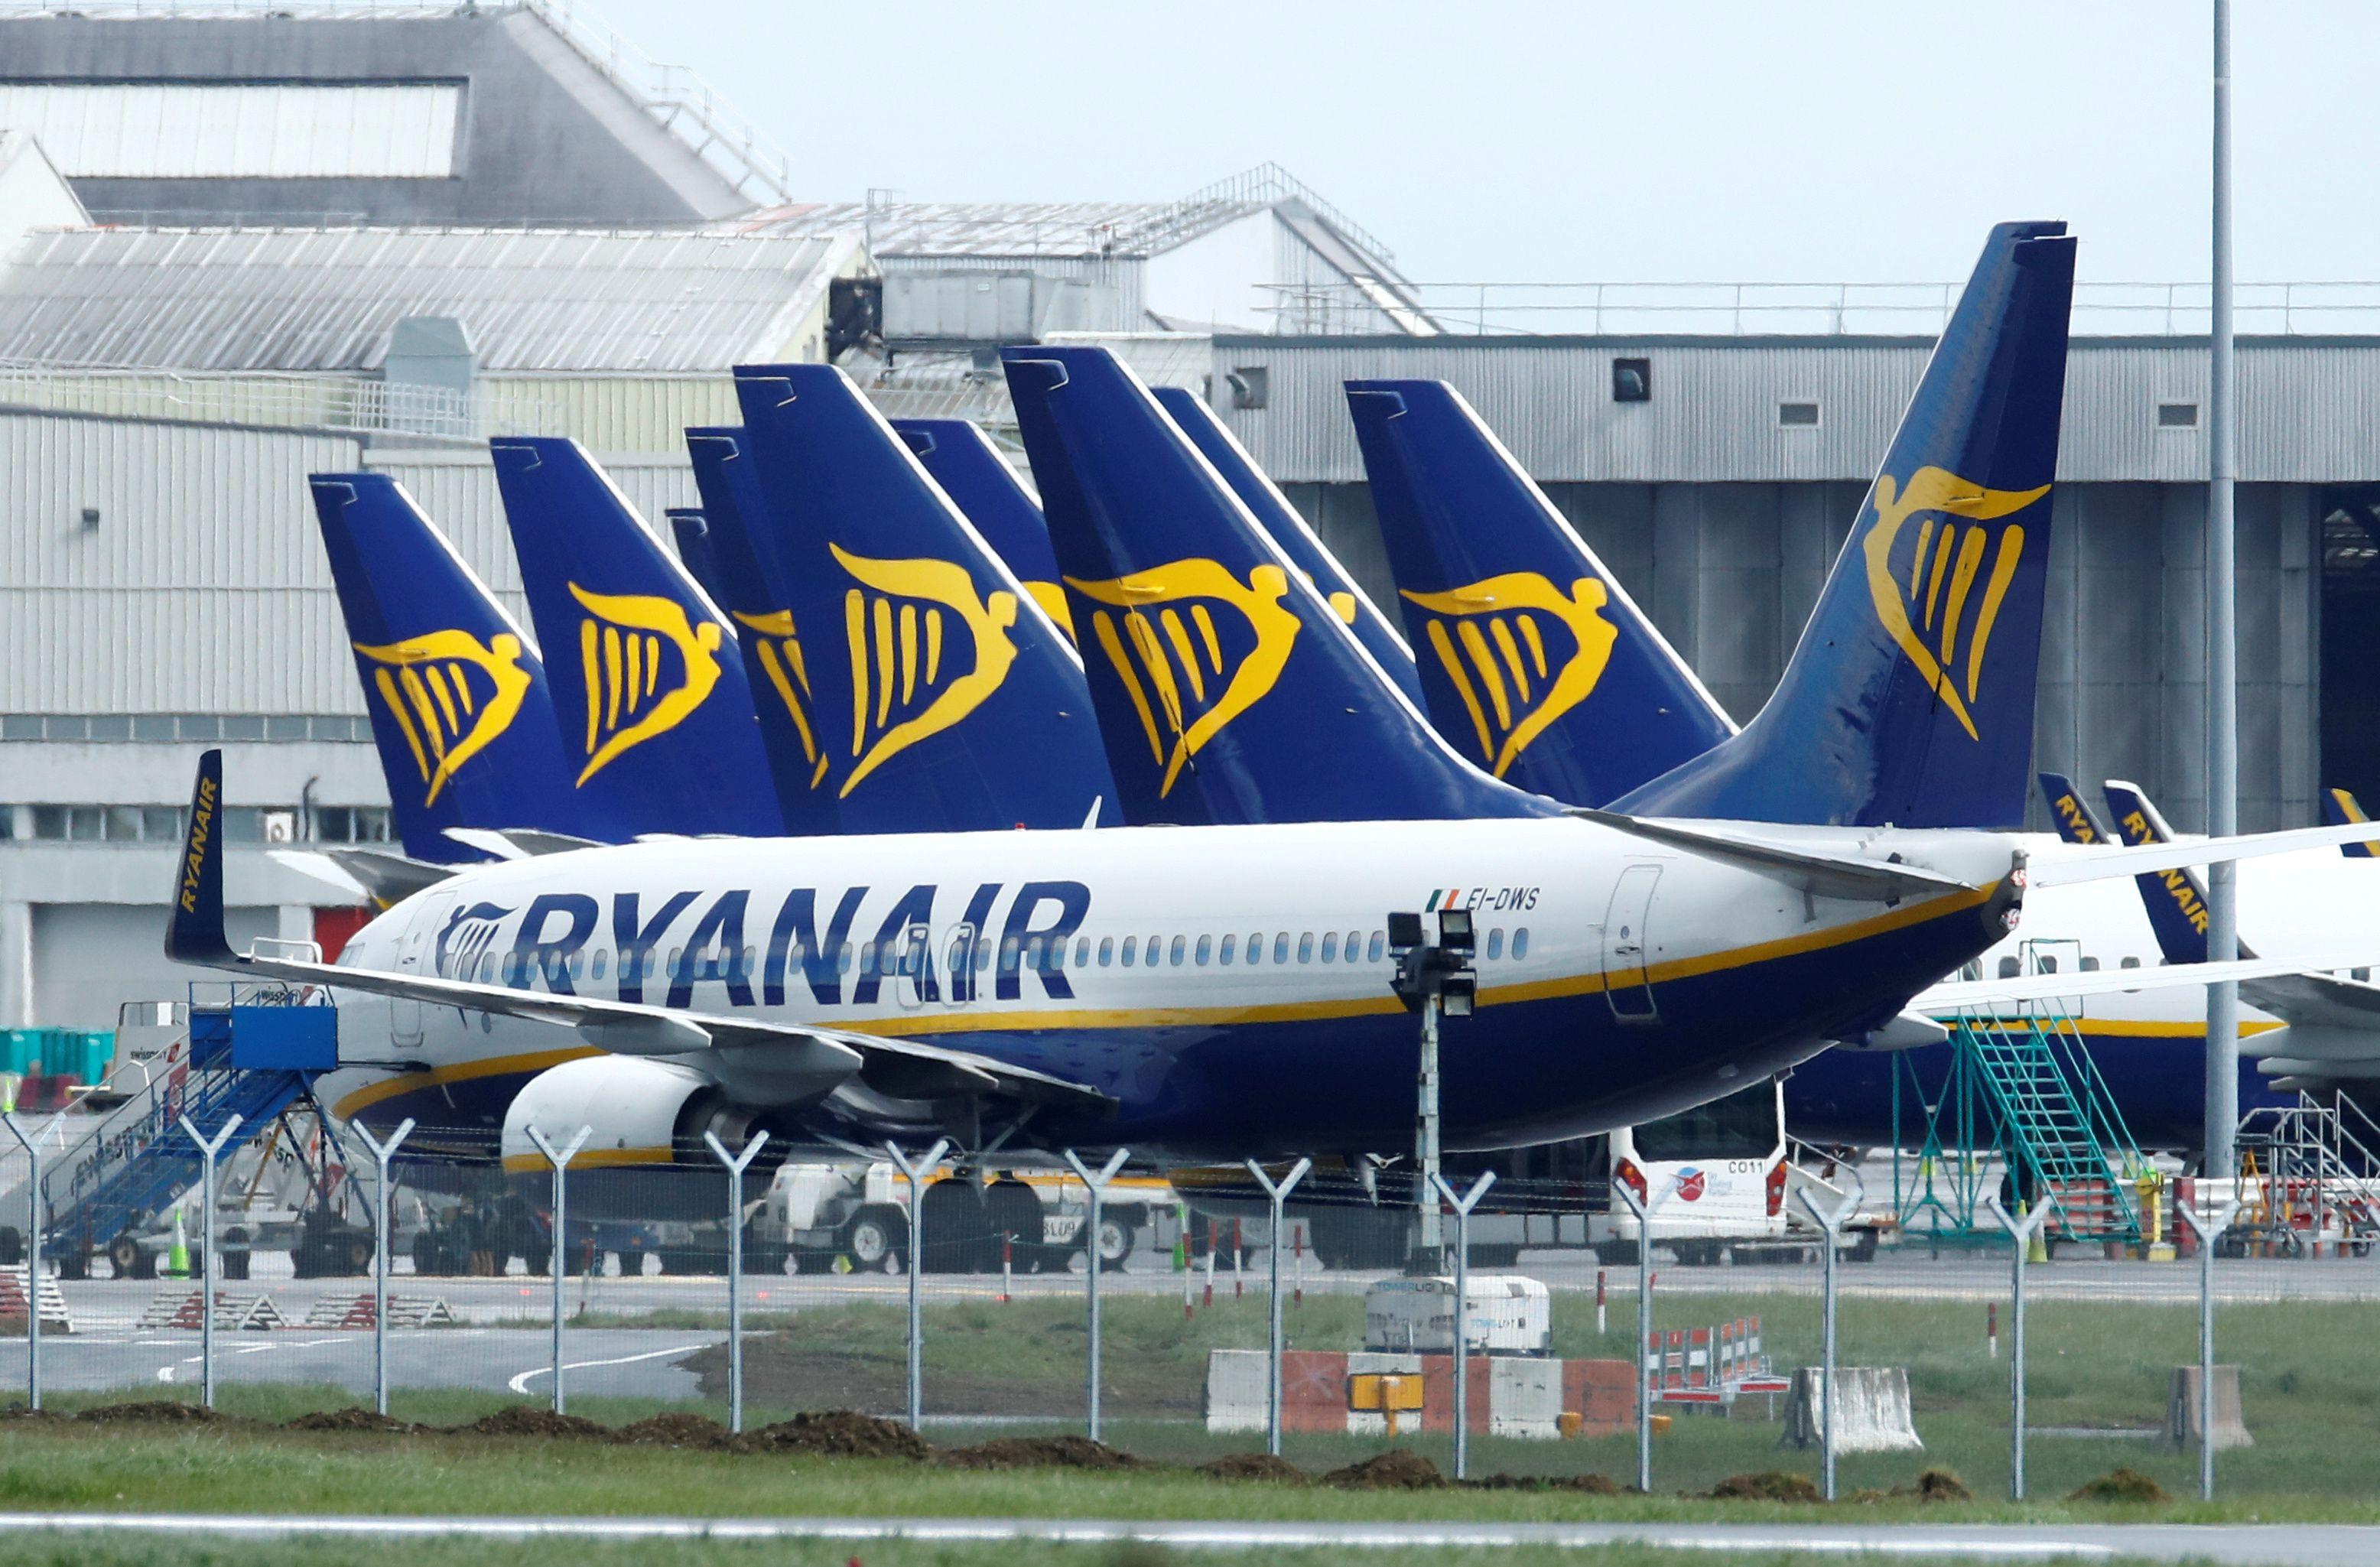 Ryanair planes at Dublin Airport after the outbreak of the coronavirus disease (COVID-19), Dublin, Ireland, May 1, 2020. REUTERS/Jason Cairnduff/File Photo